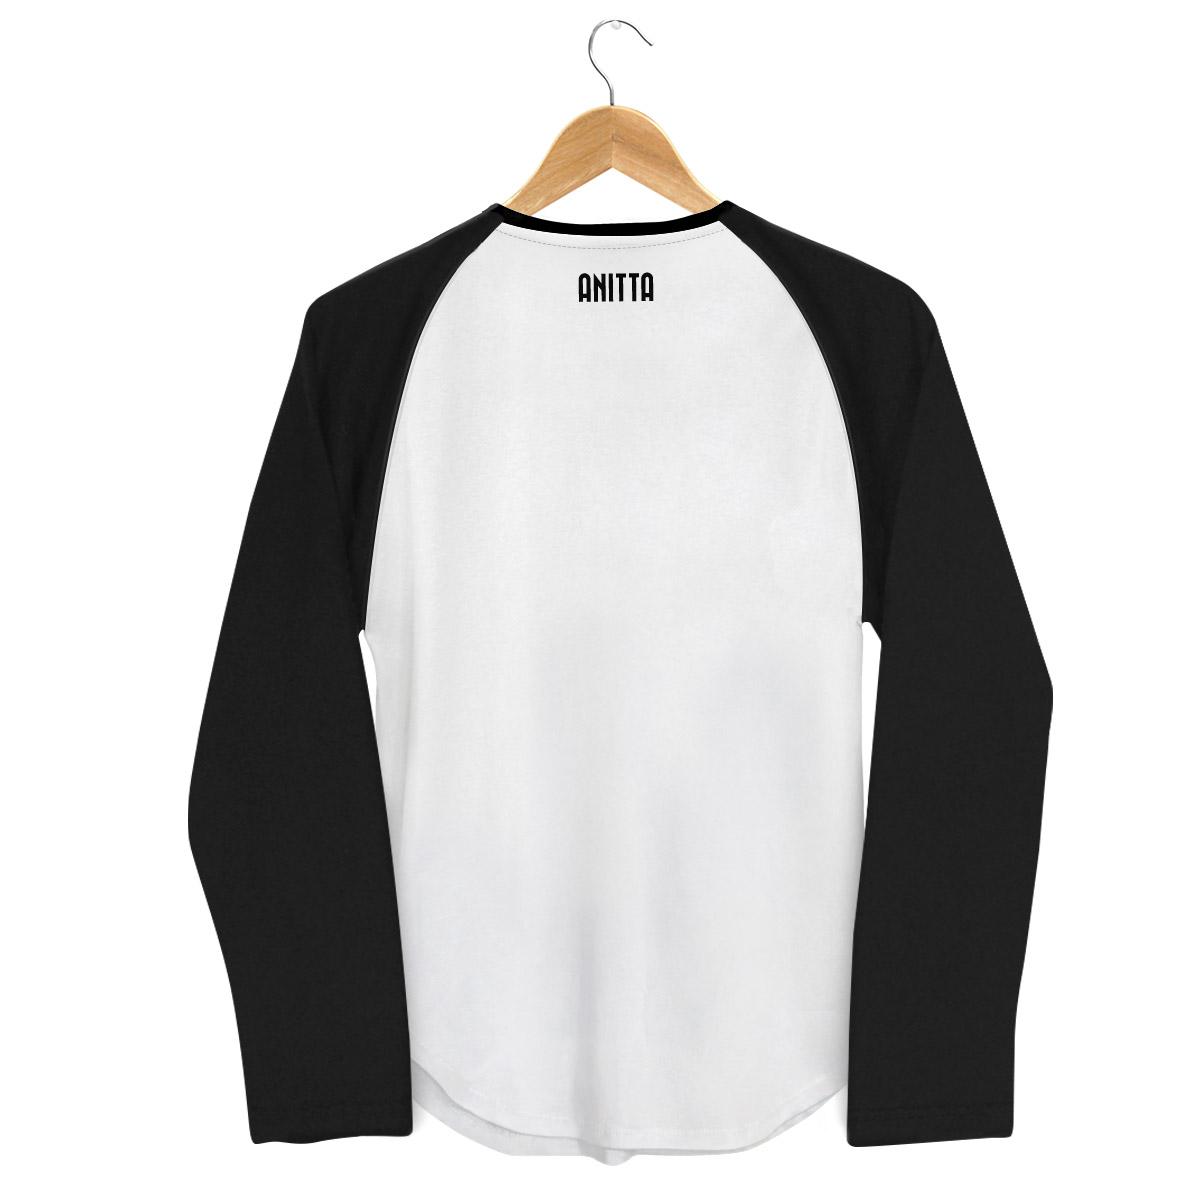 Camiseta Raglan Feminina Anitta Pop Art